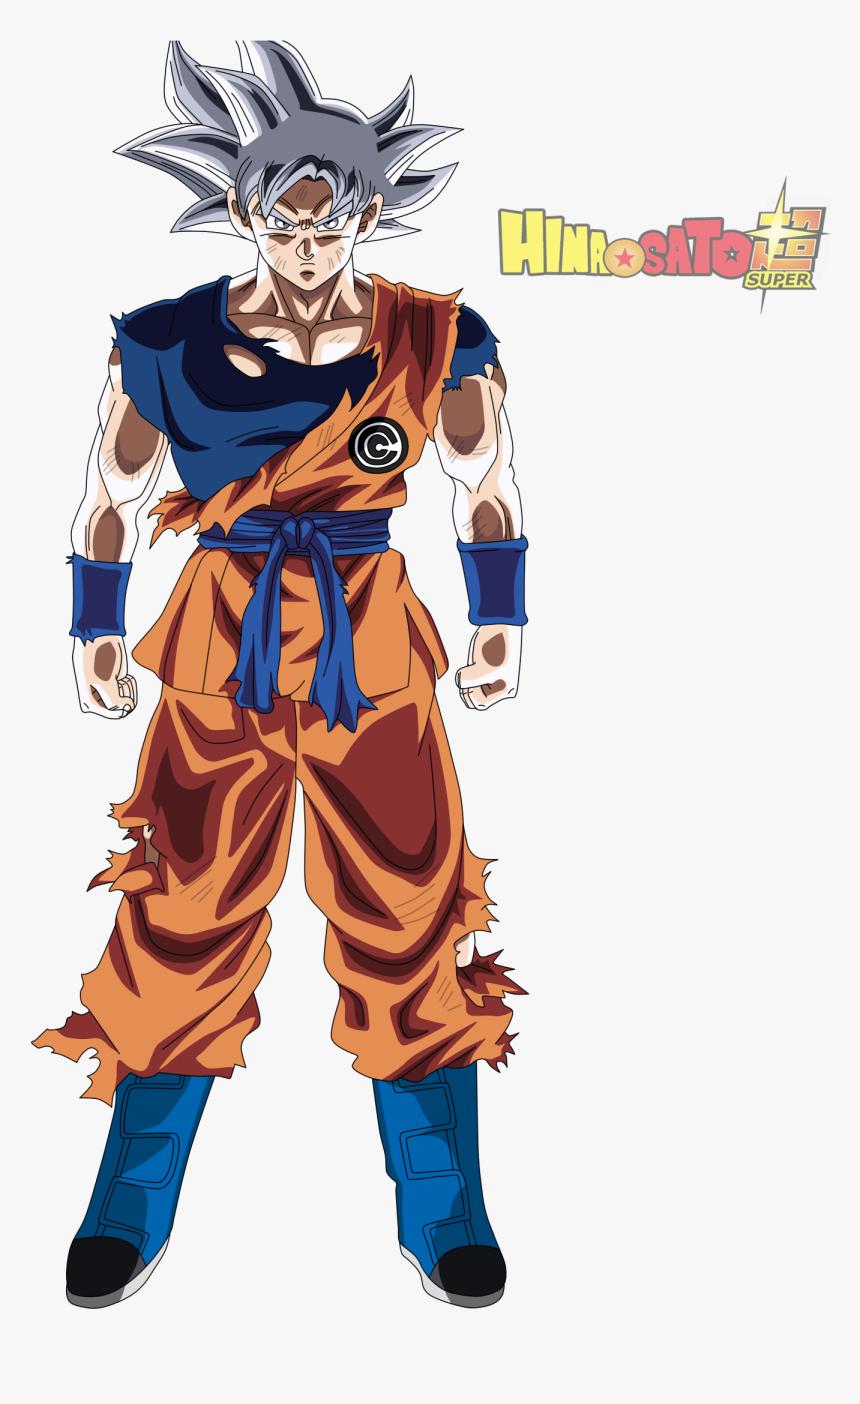 Super Dragon Ball Heroes By Hinasatosuper - Goku Dragon Ball Heroes, HD Png Download, Free Download